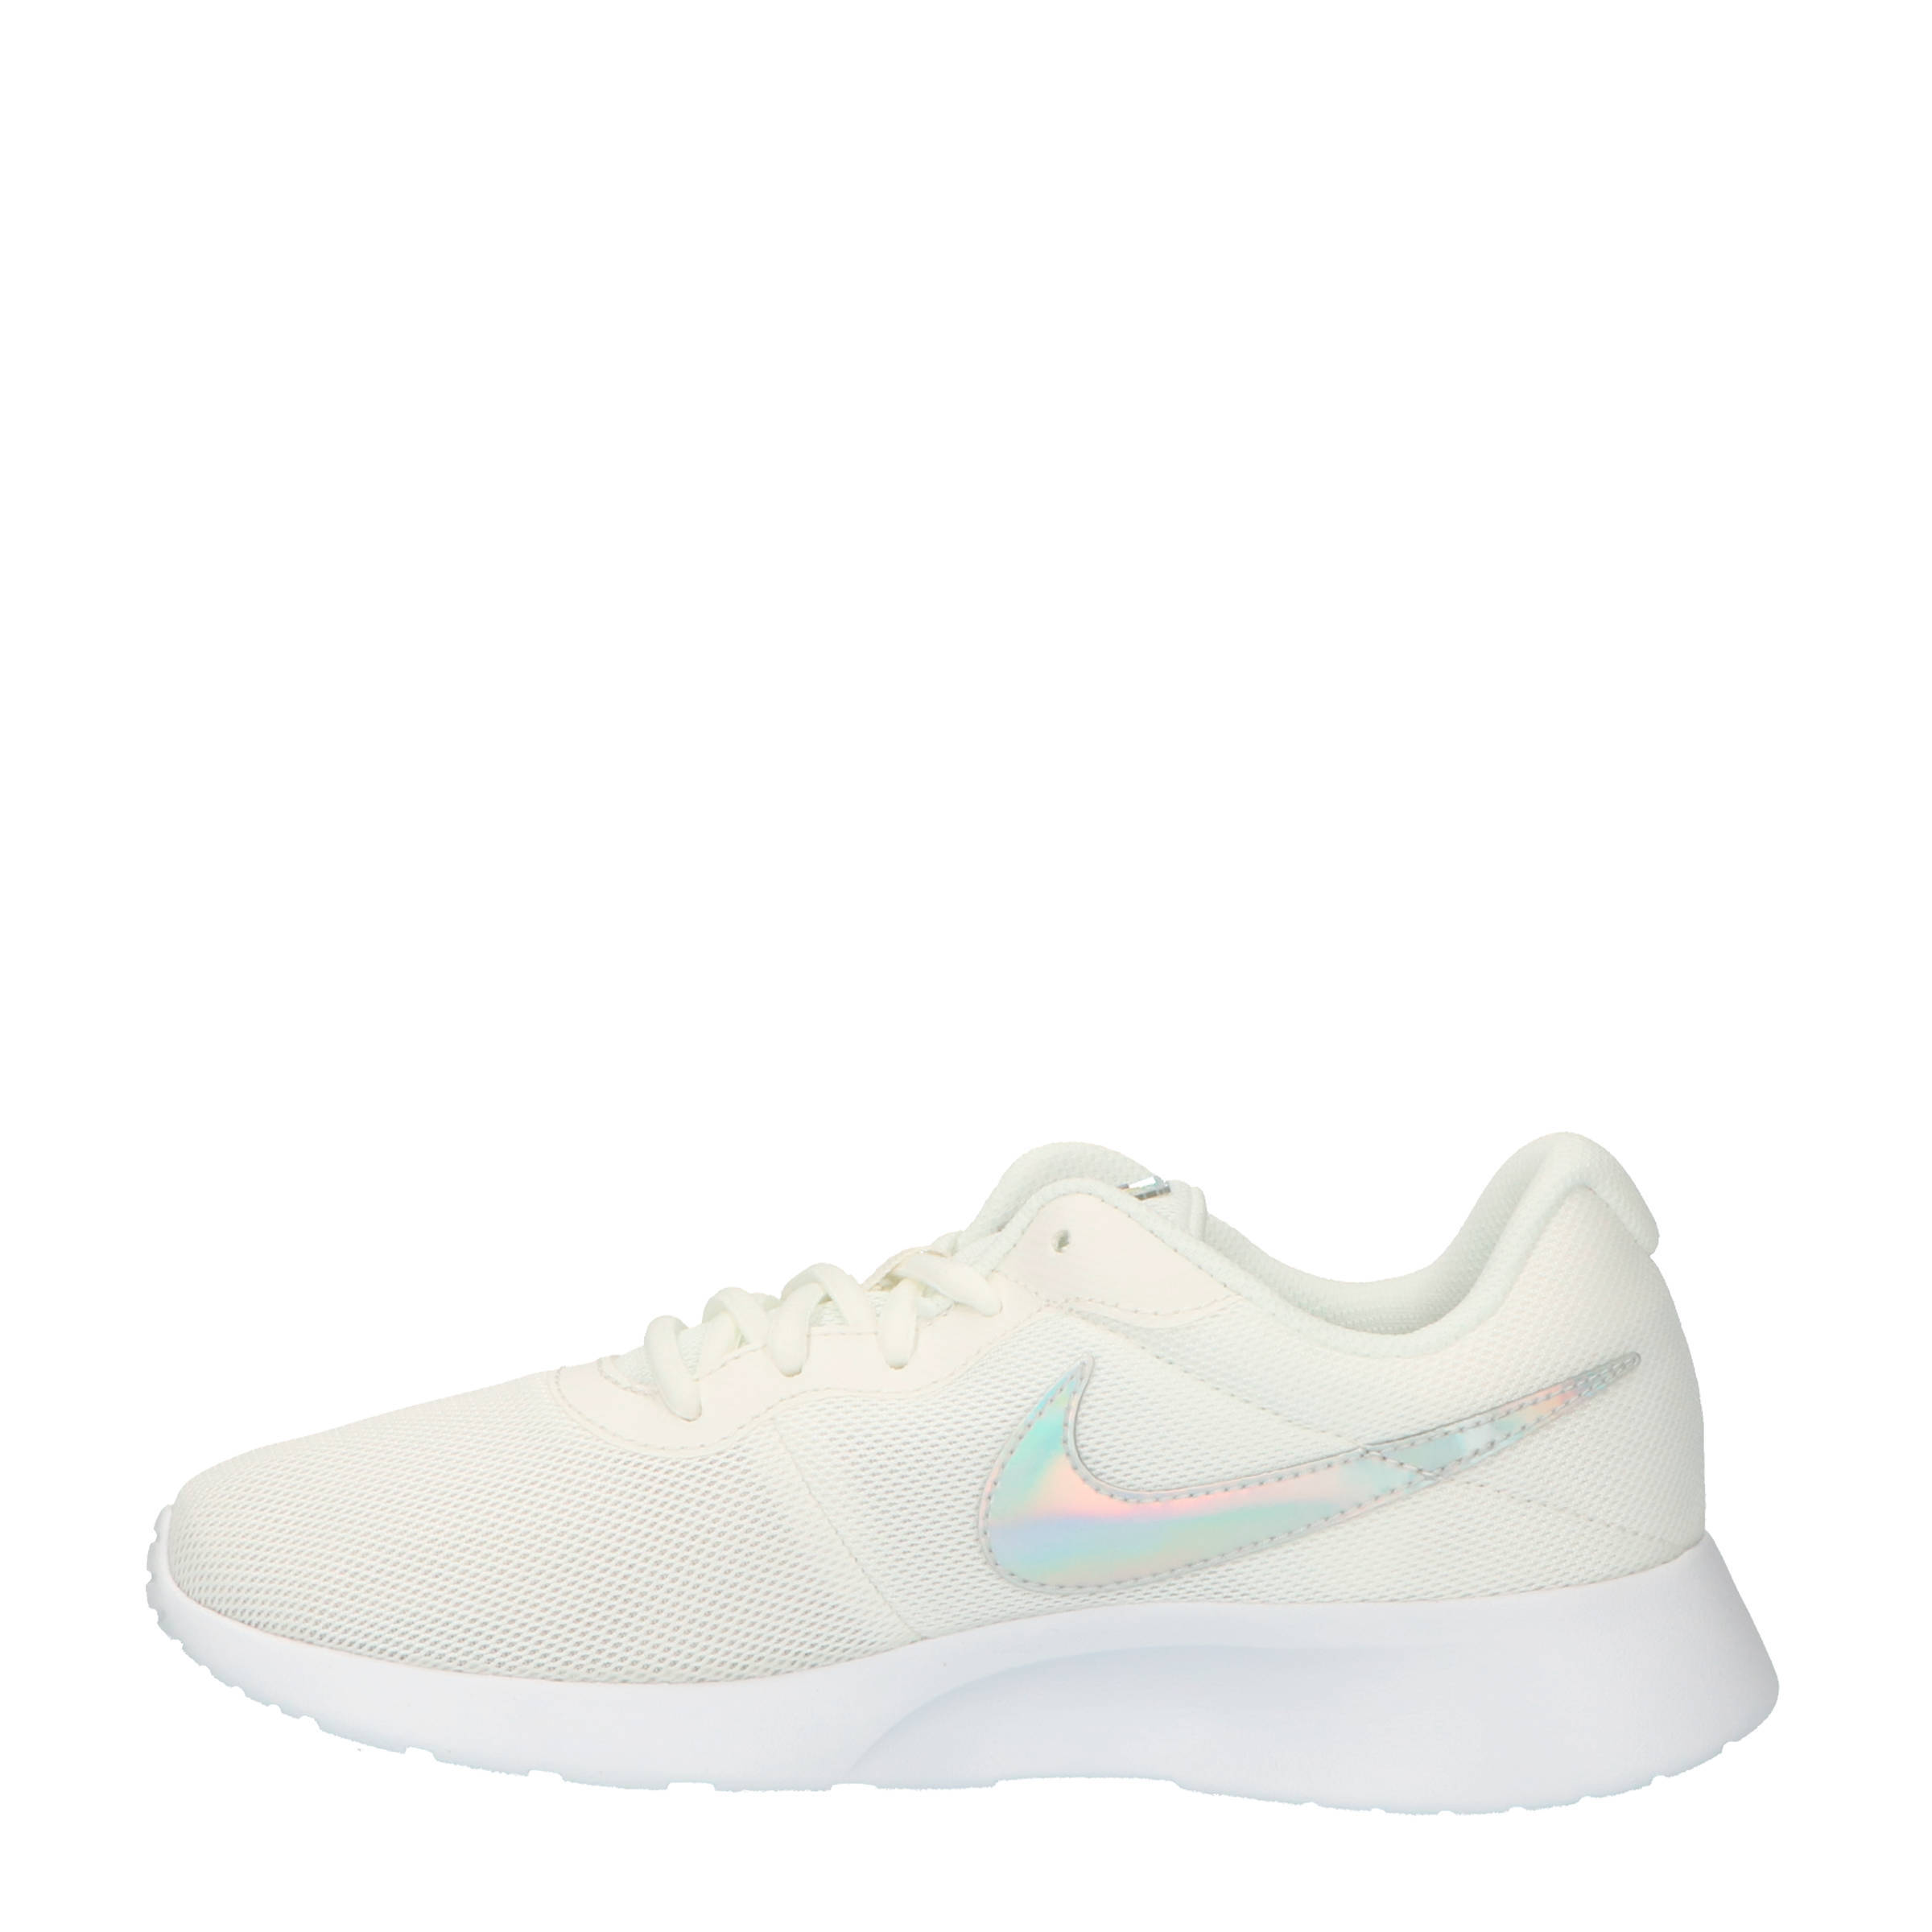 b55bf955340 Nike Tanjun Tanjun sneakers wit/zilver | wehkamp